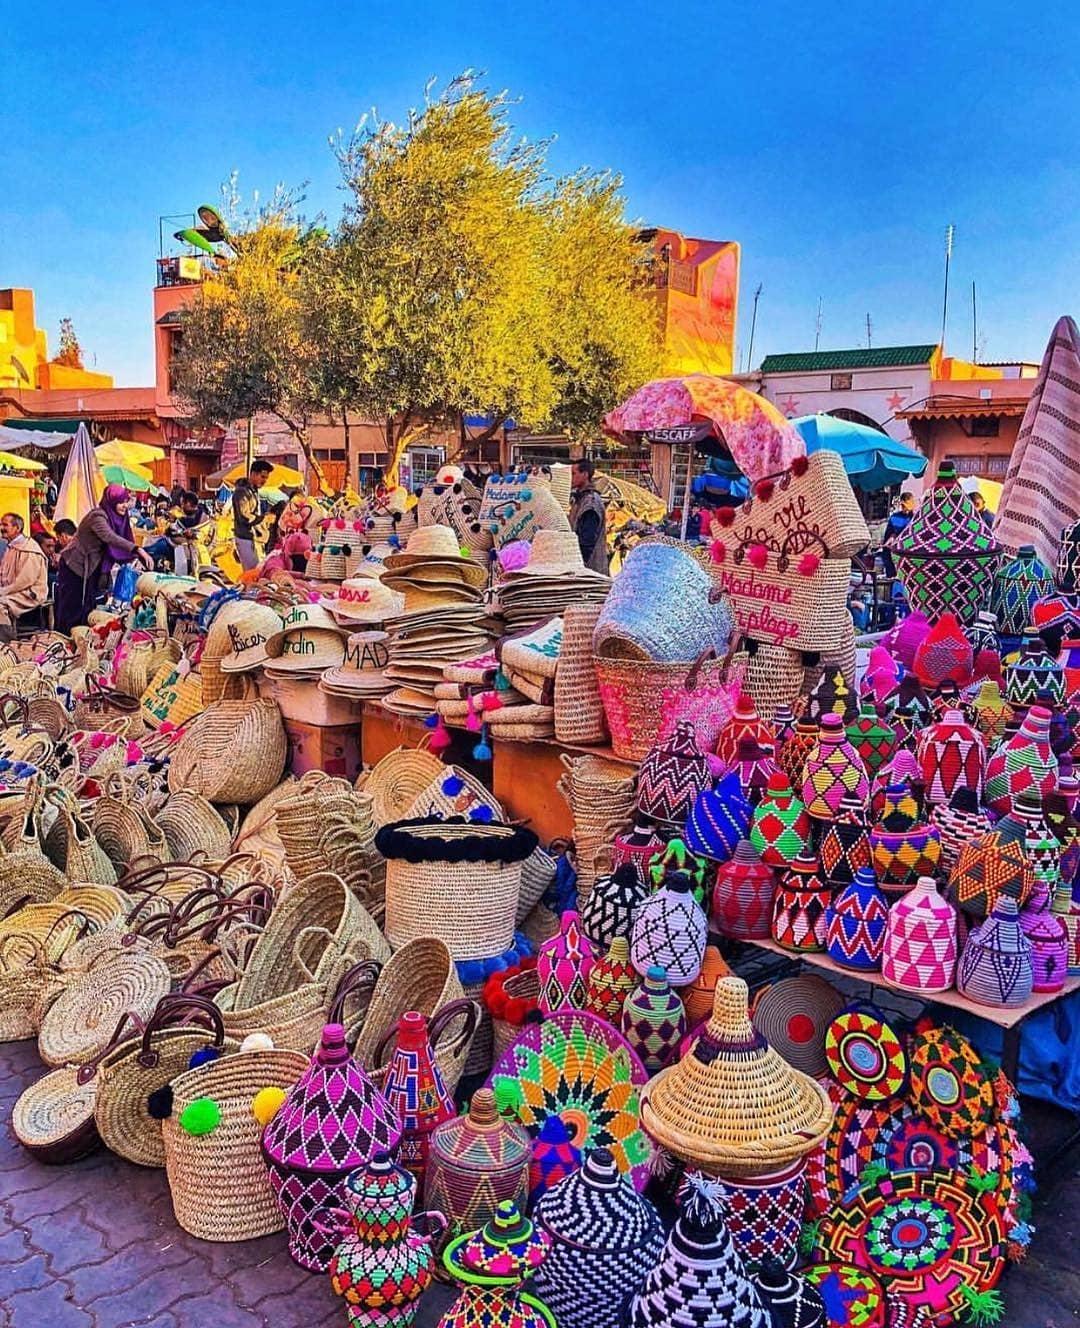 Top Reasons to Visit Marrakech: Marrakech souks